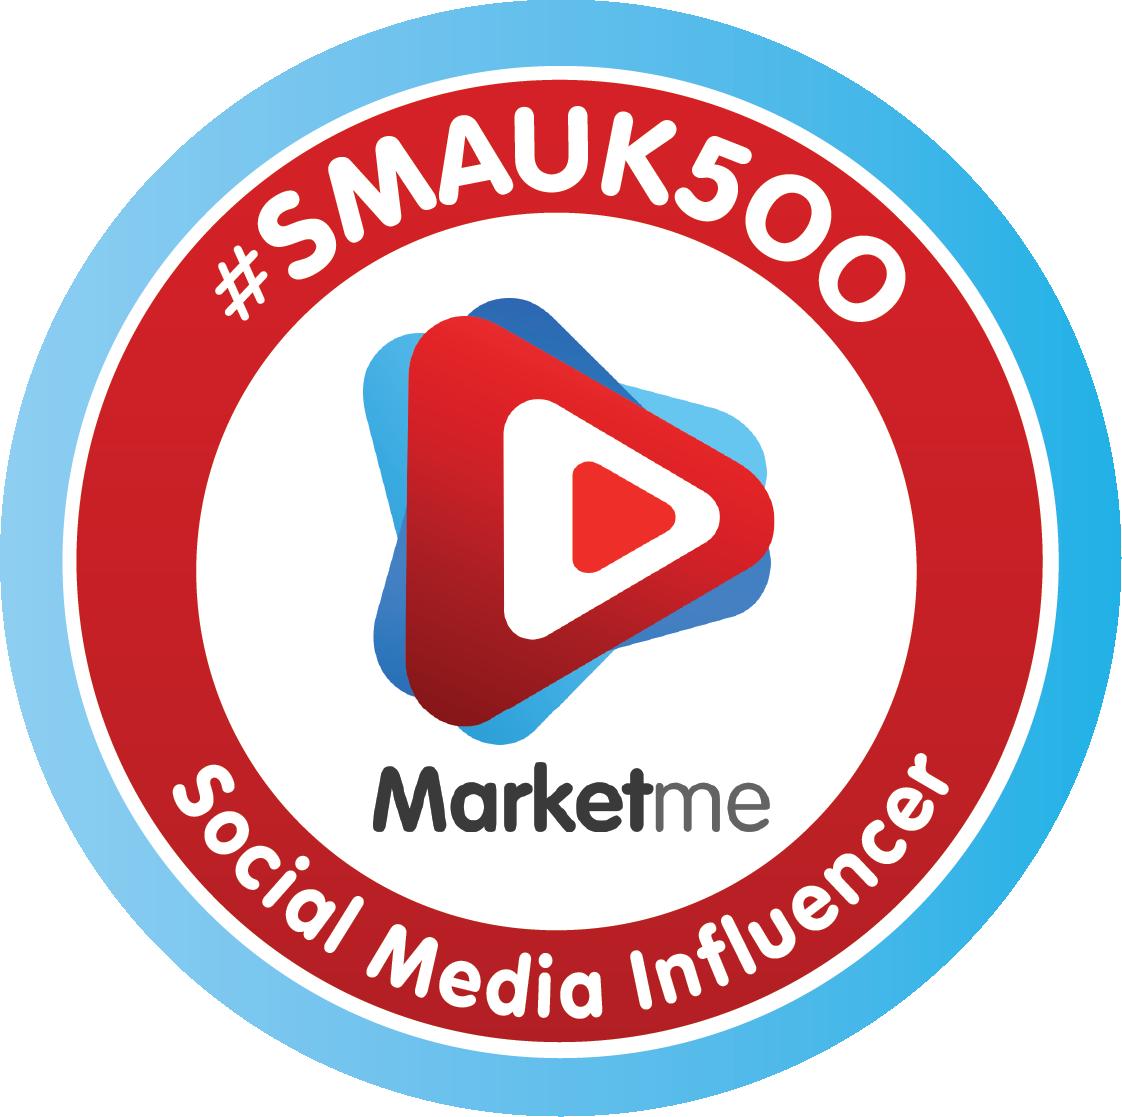 MARKETME TOP 50 UK SCOIAL MEDIA AGENCIES